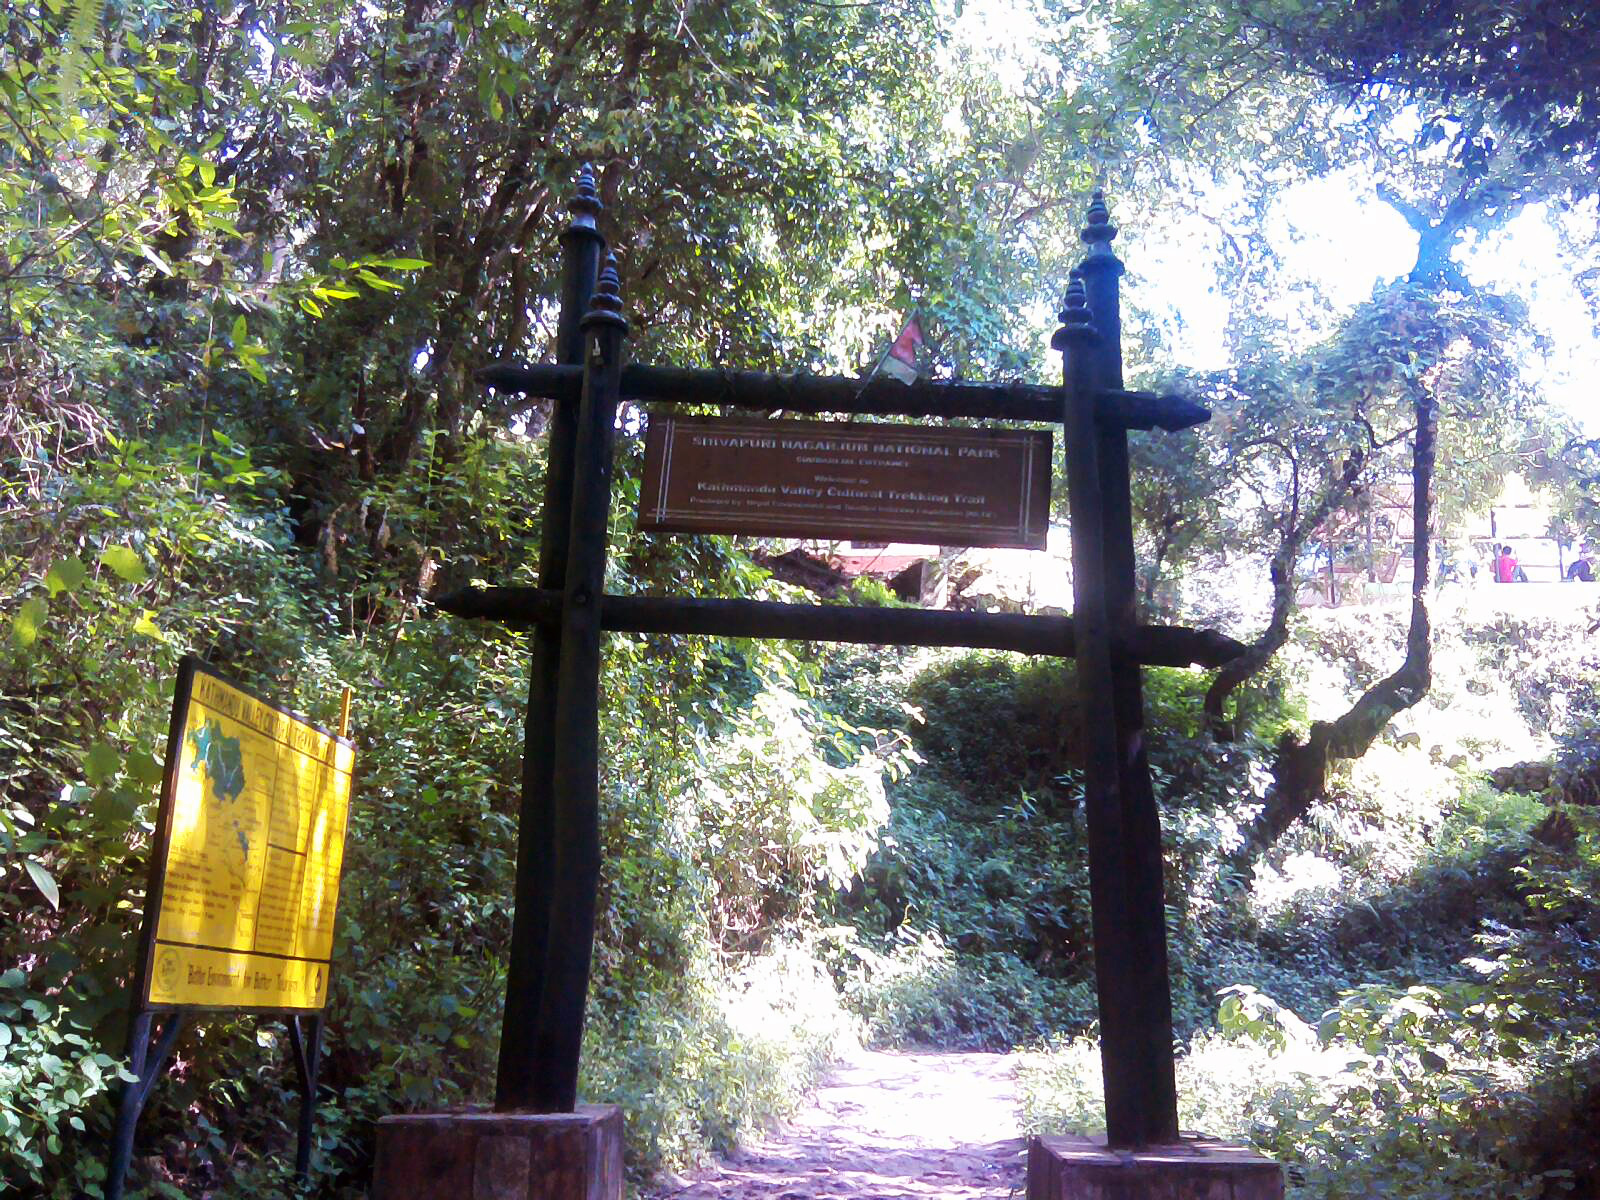 Shivapuri Nagarjun National Park Wide Gate And Board on Where Is Kathmandu Nepal Located On A Map